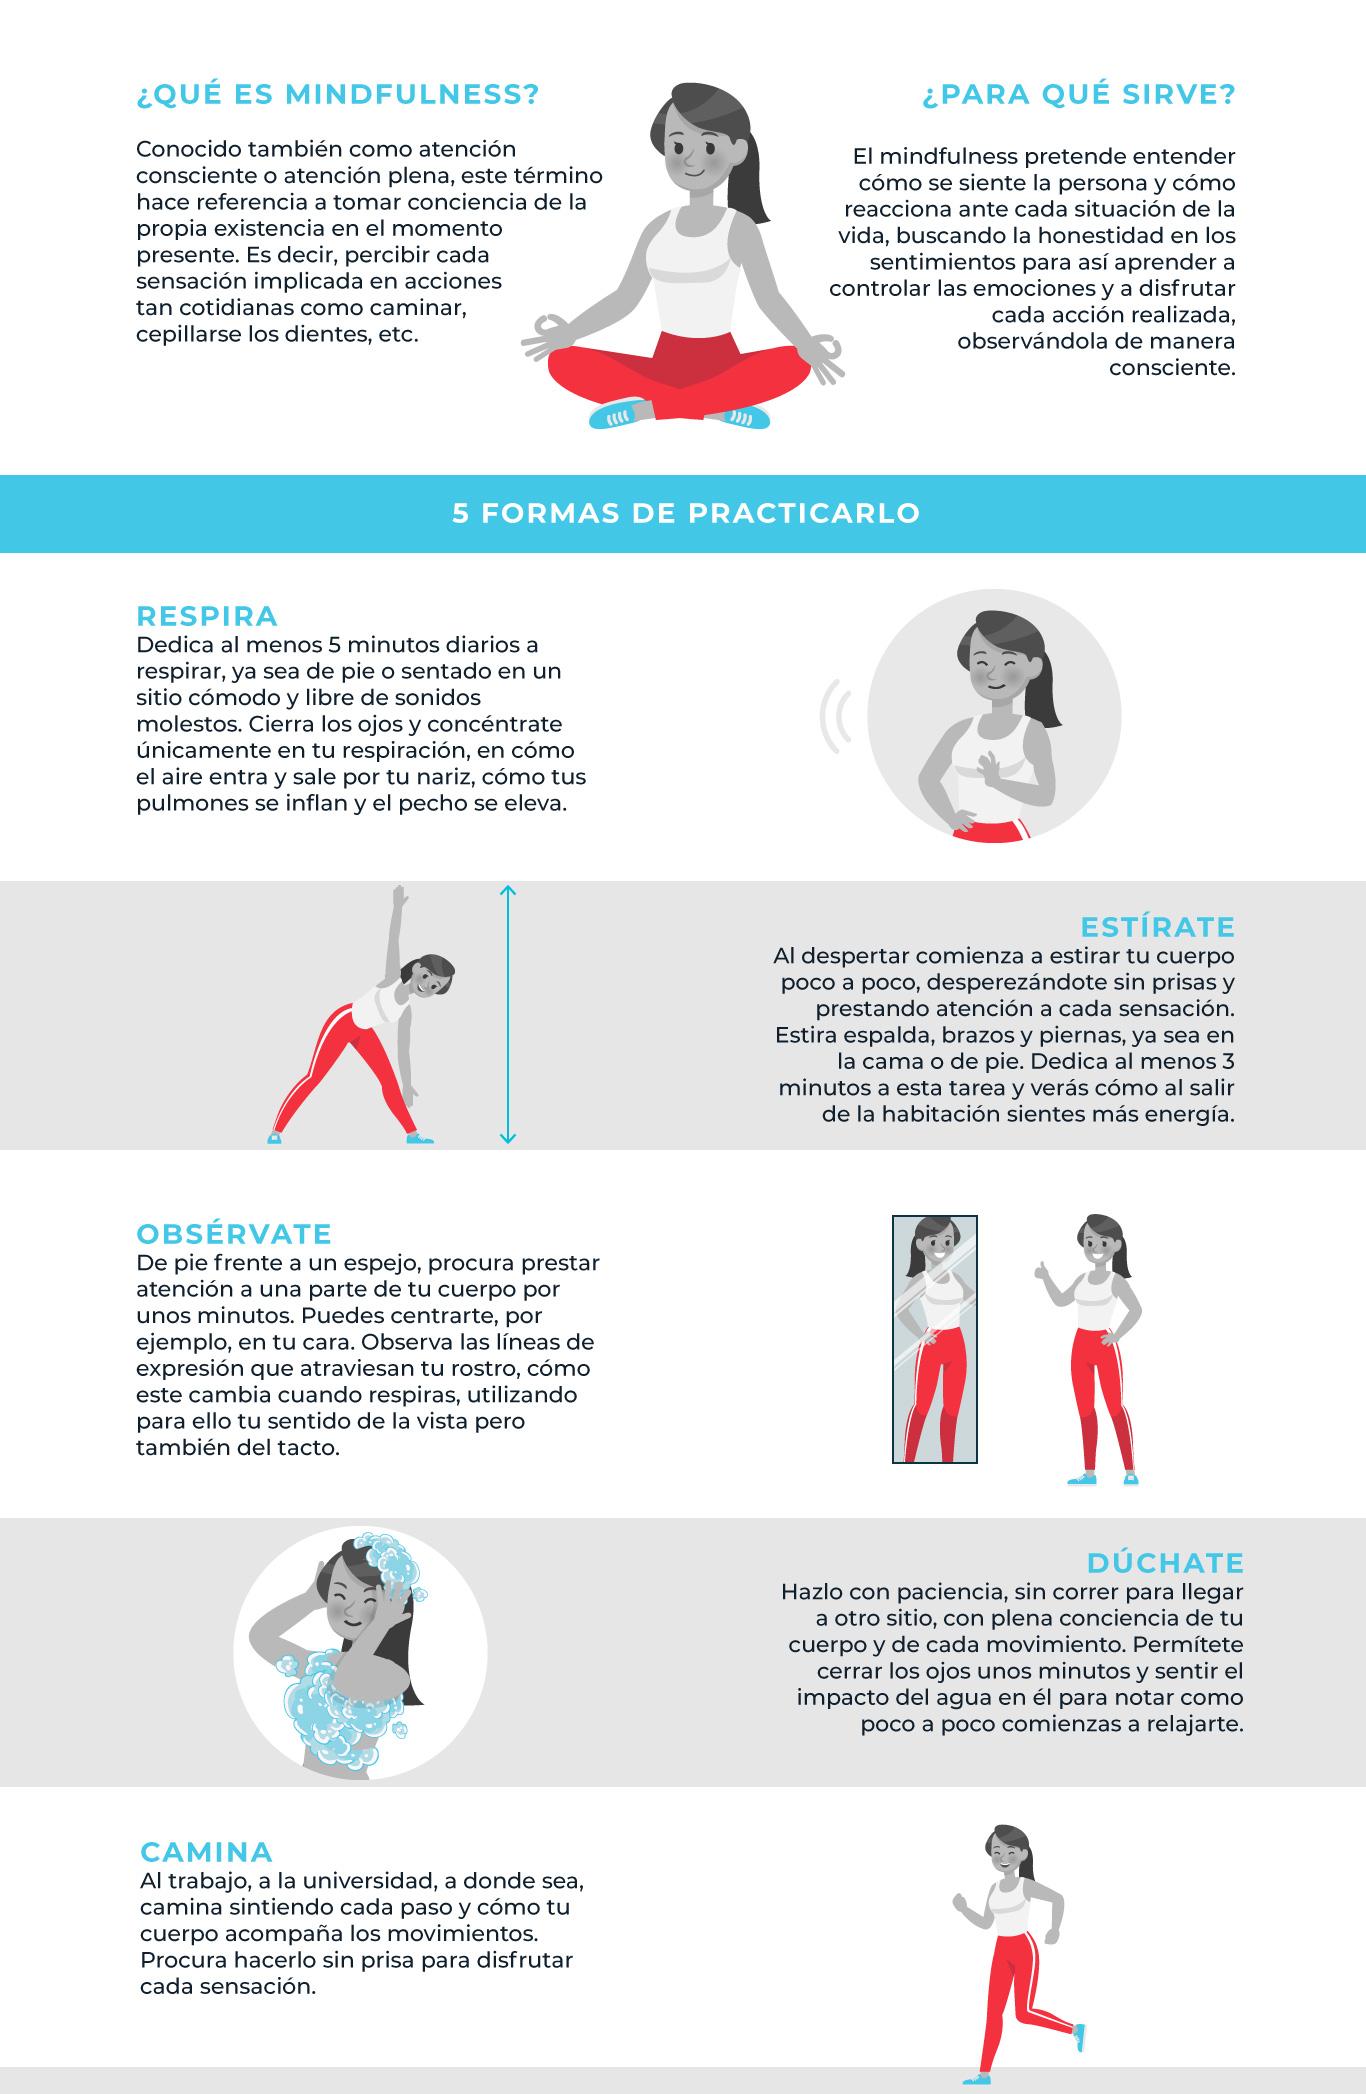 Infografia - 5 formas de practicar mindfulness